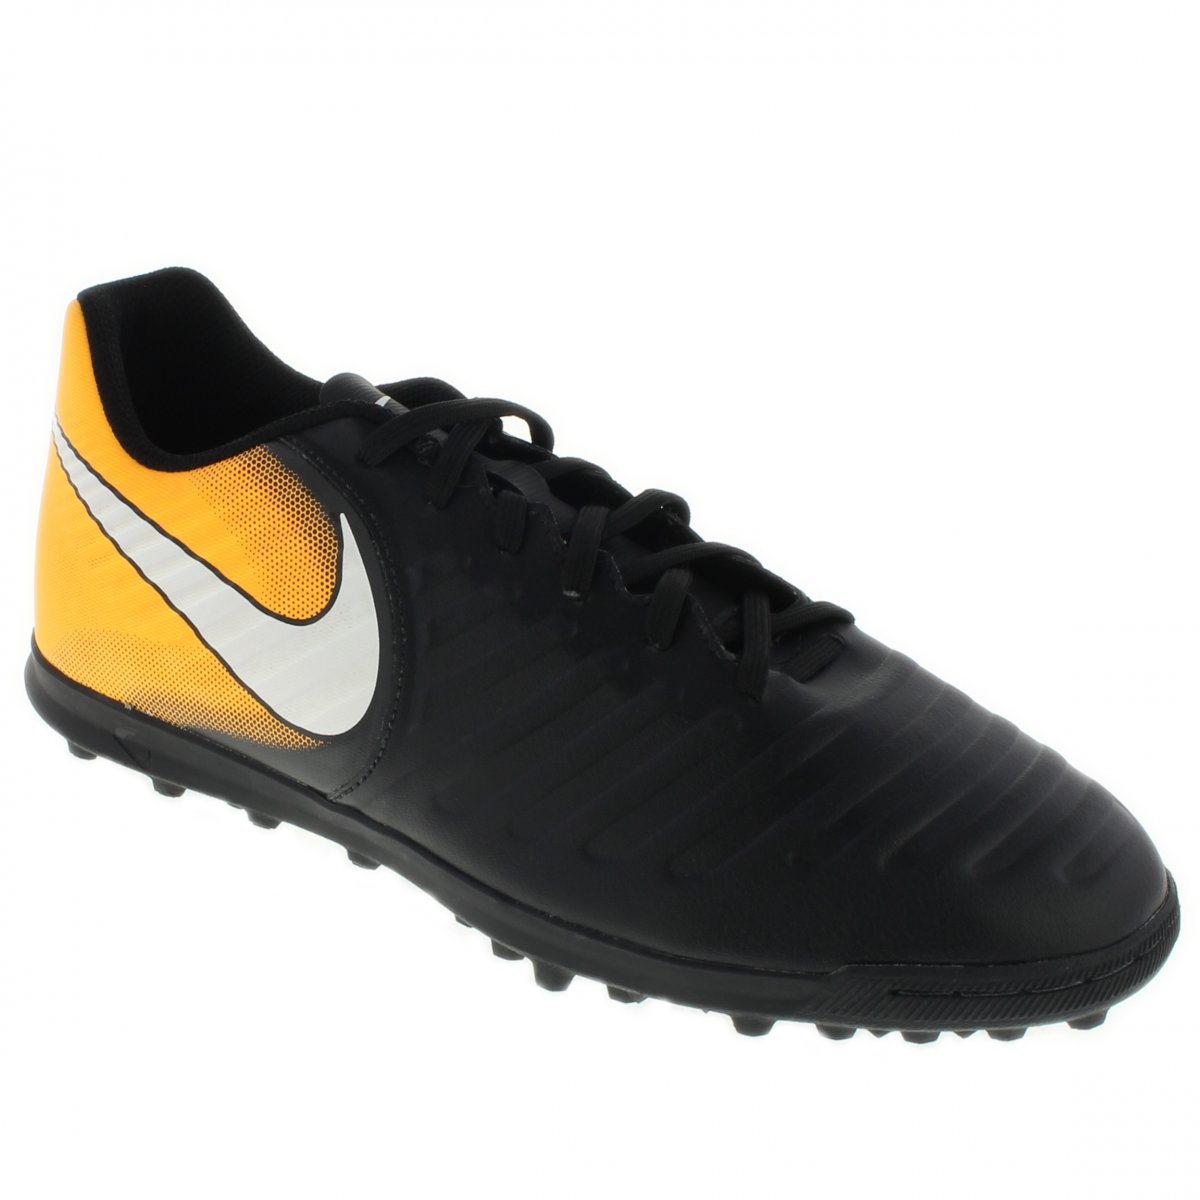 4289e8bb0608c Society Nike Tiempox Rio iv tf | Preto/laranja | Coutope